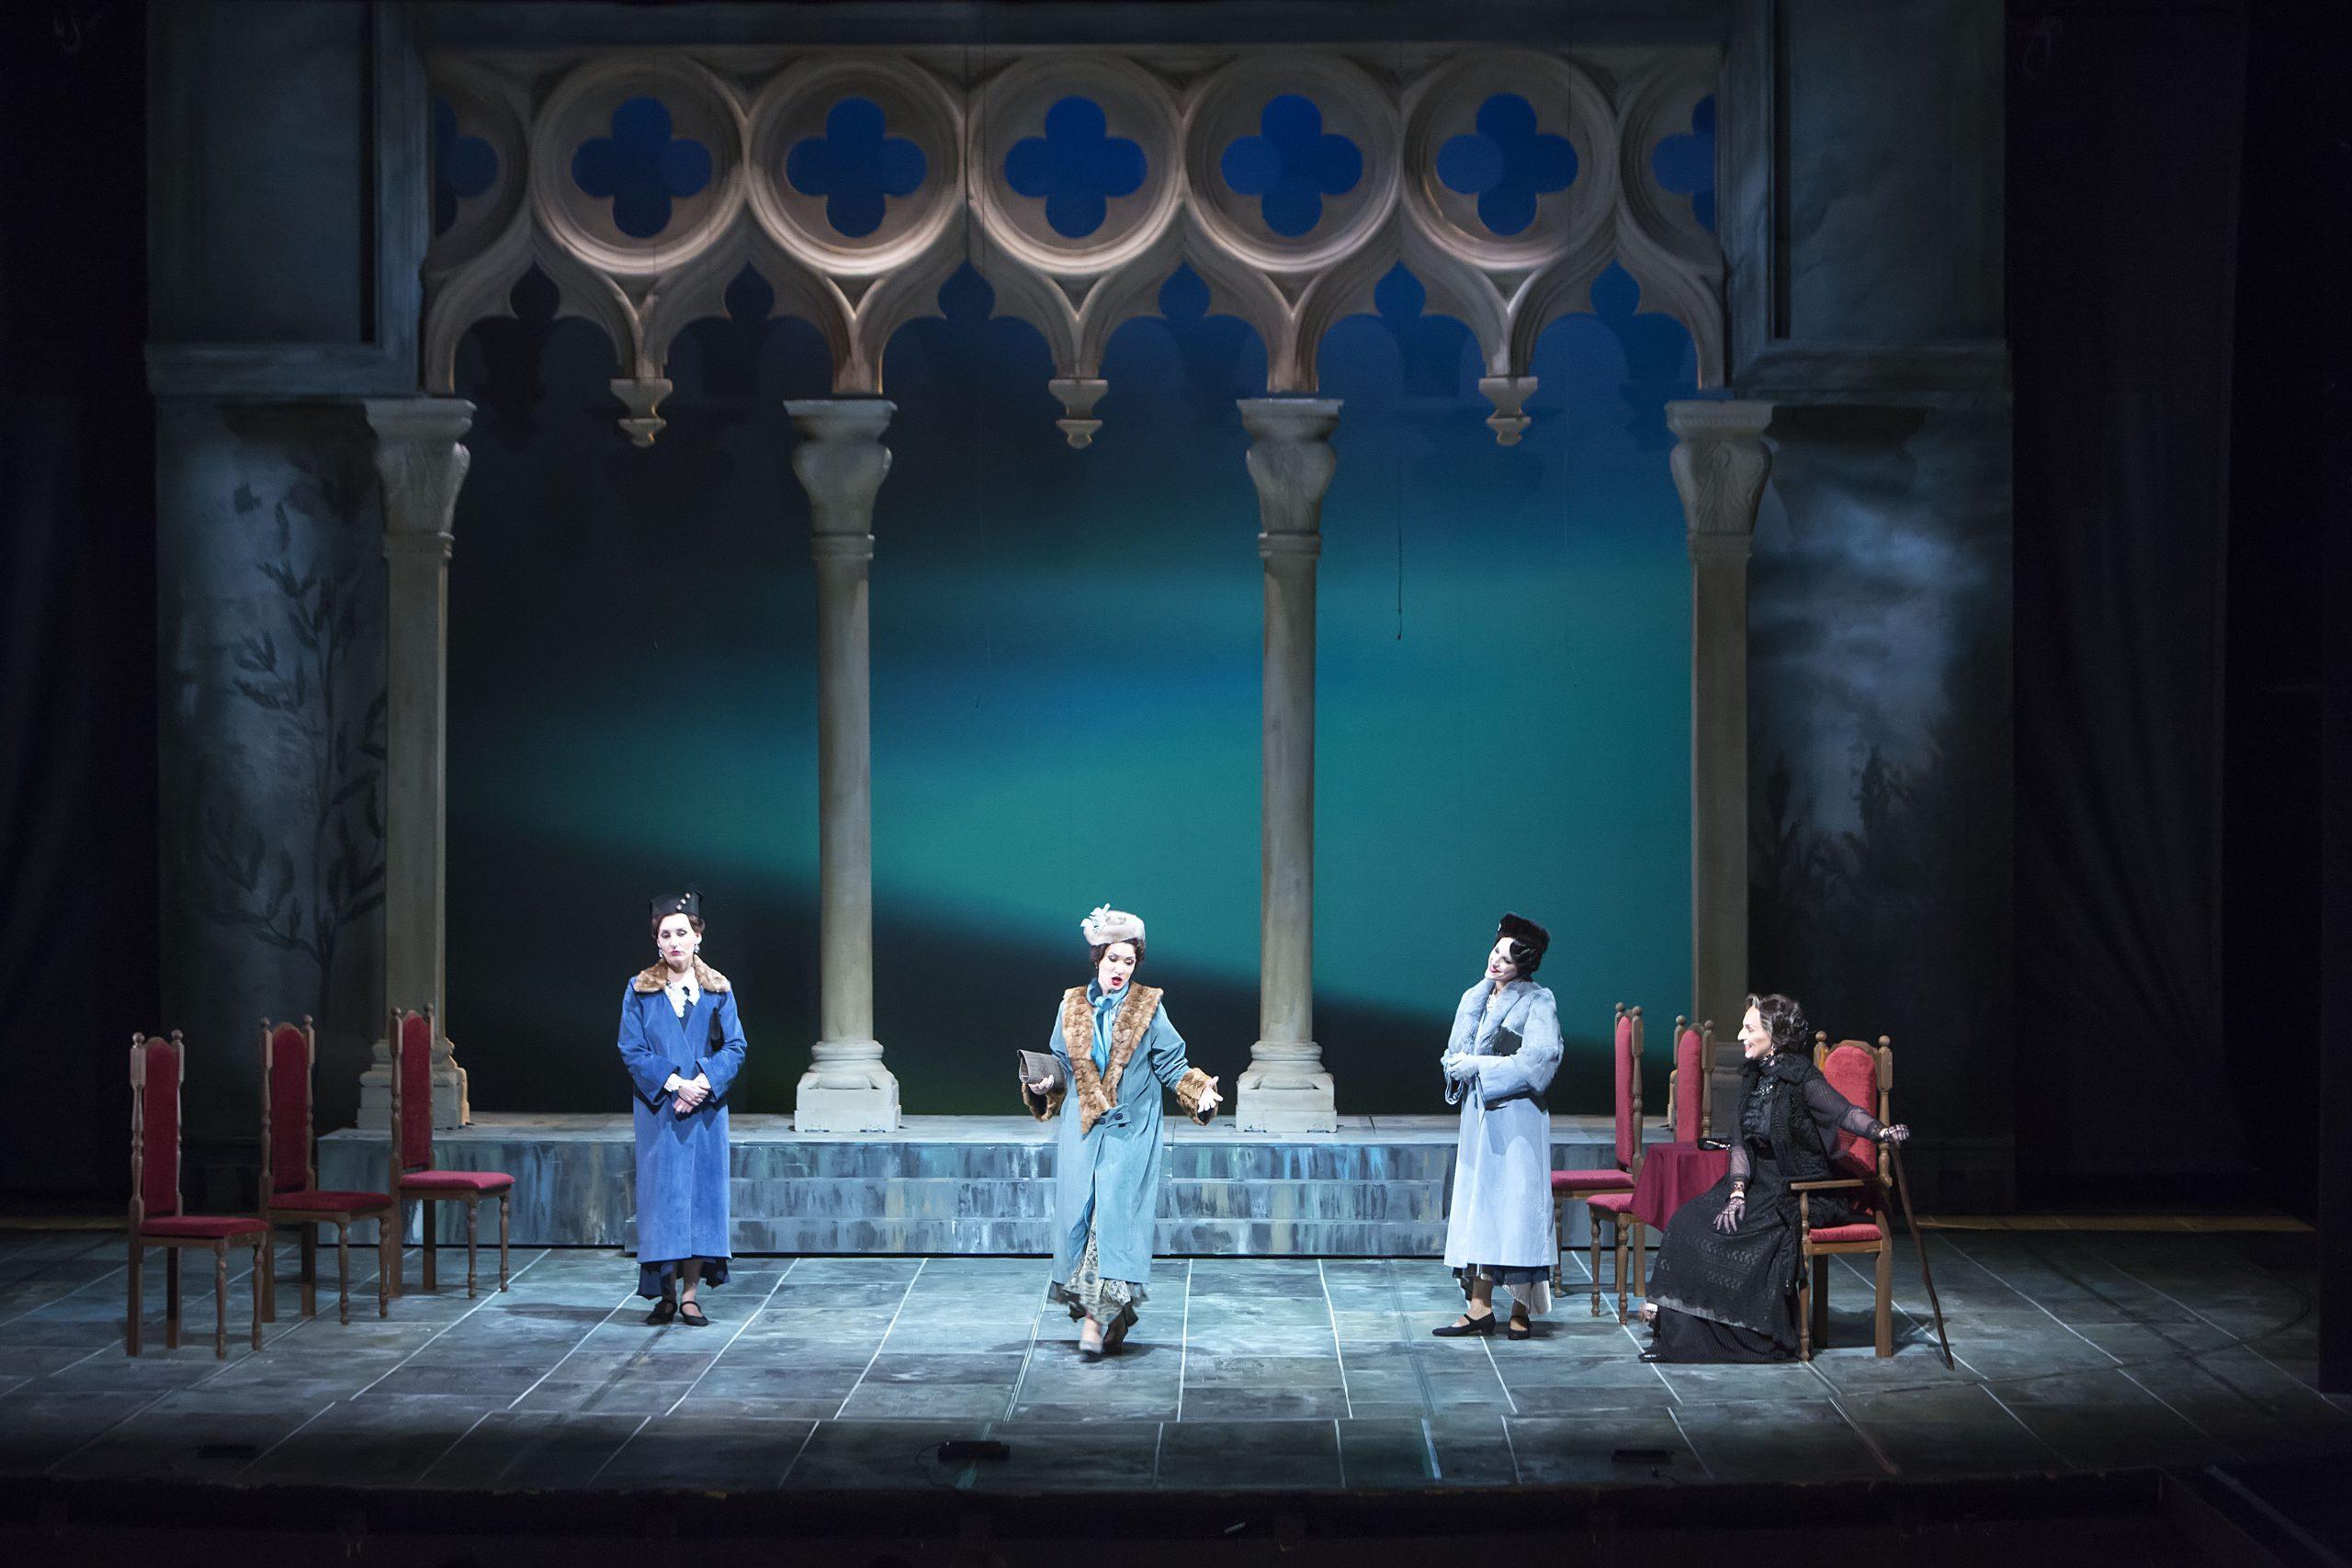 Branislava Podrumac as Ore in  The Dusk (Suton) by Stevan Hristic